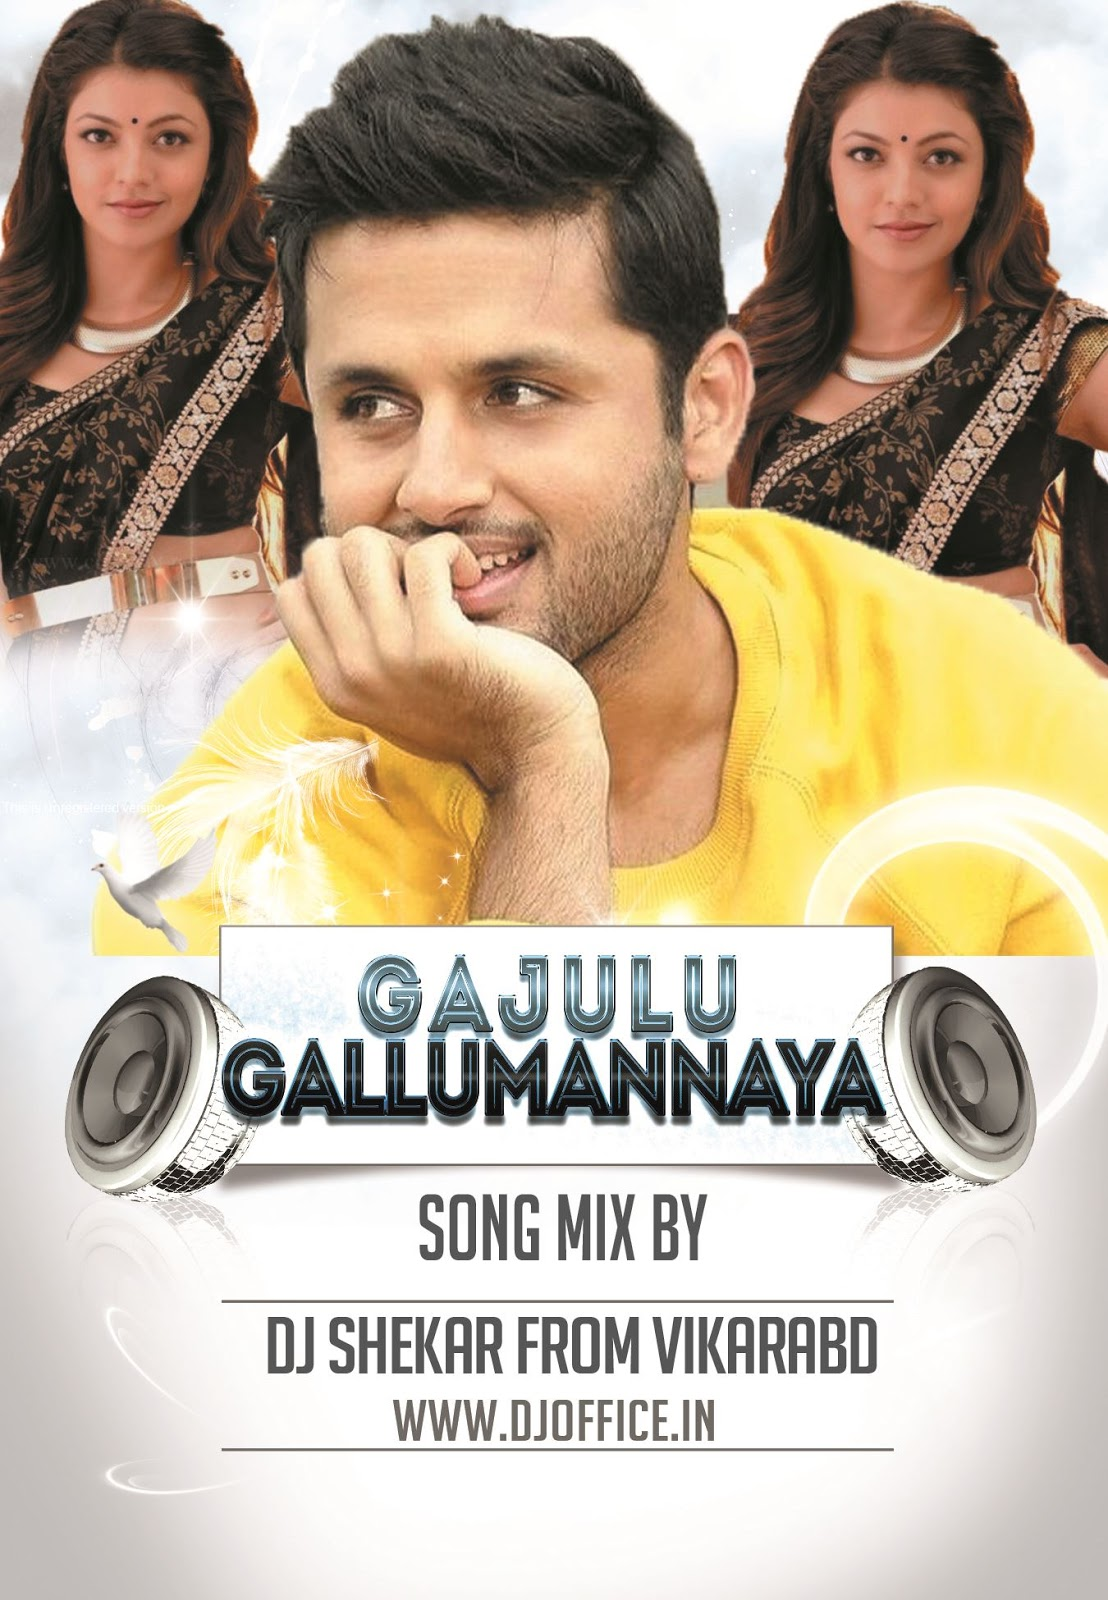 Telugu New DjSongs Song Mix Dj Shekar From Vikarabd